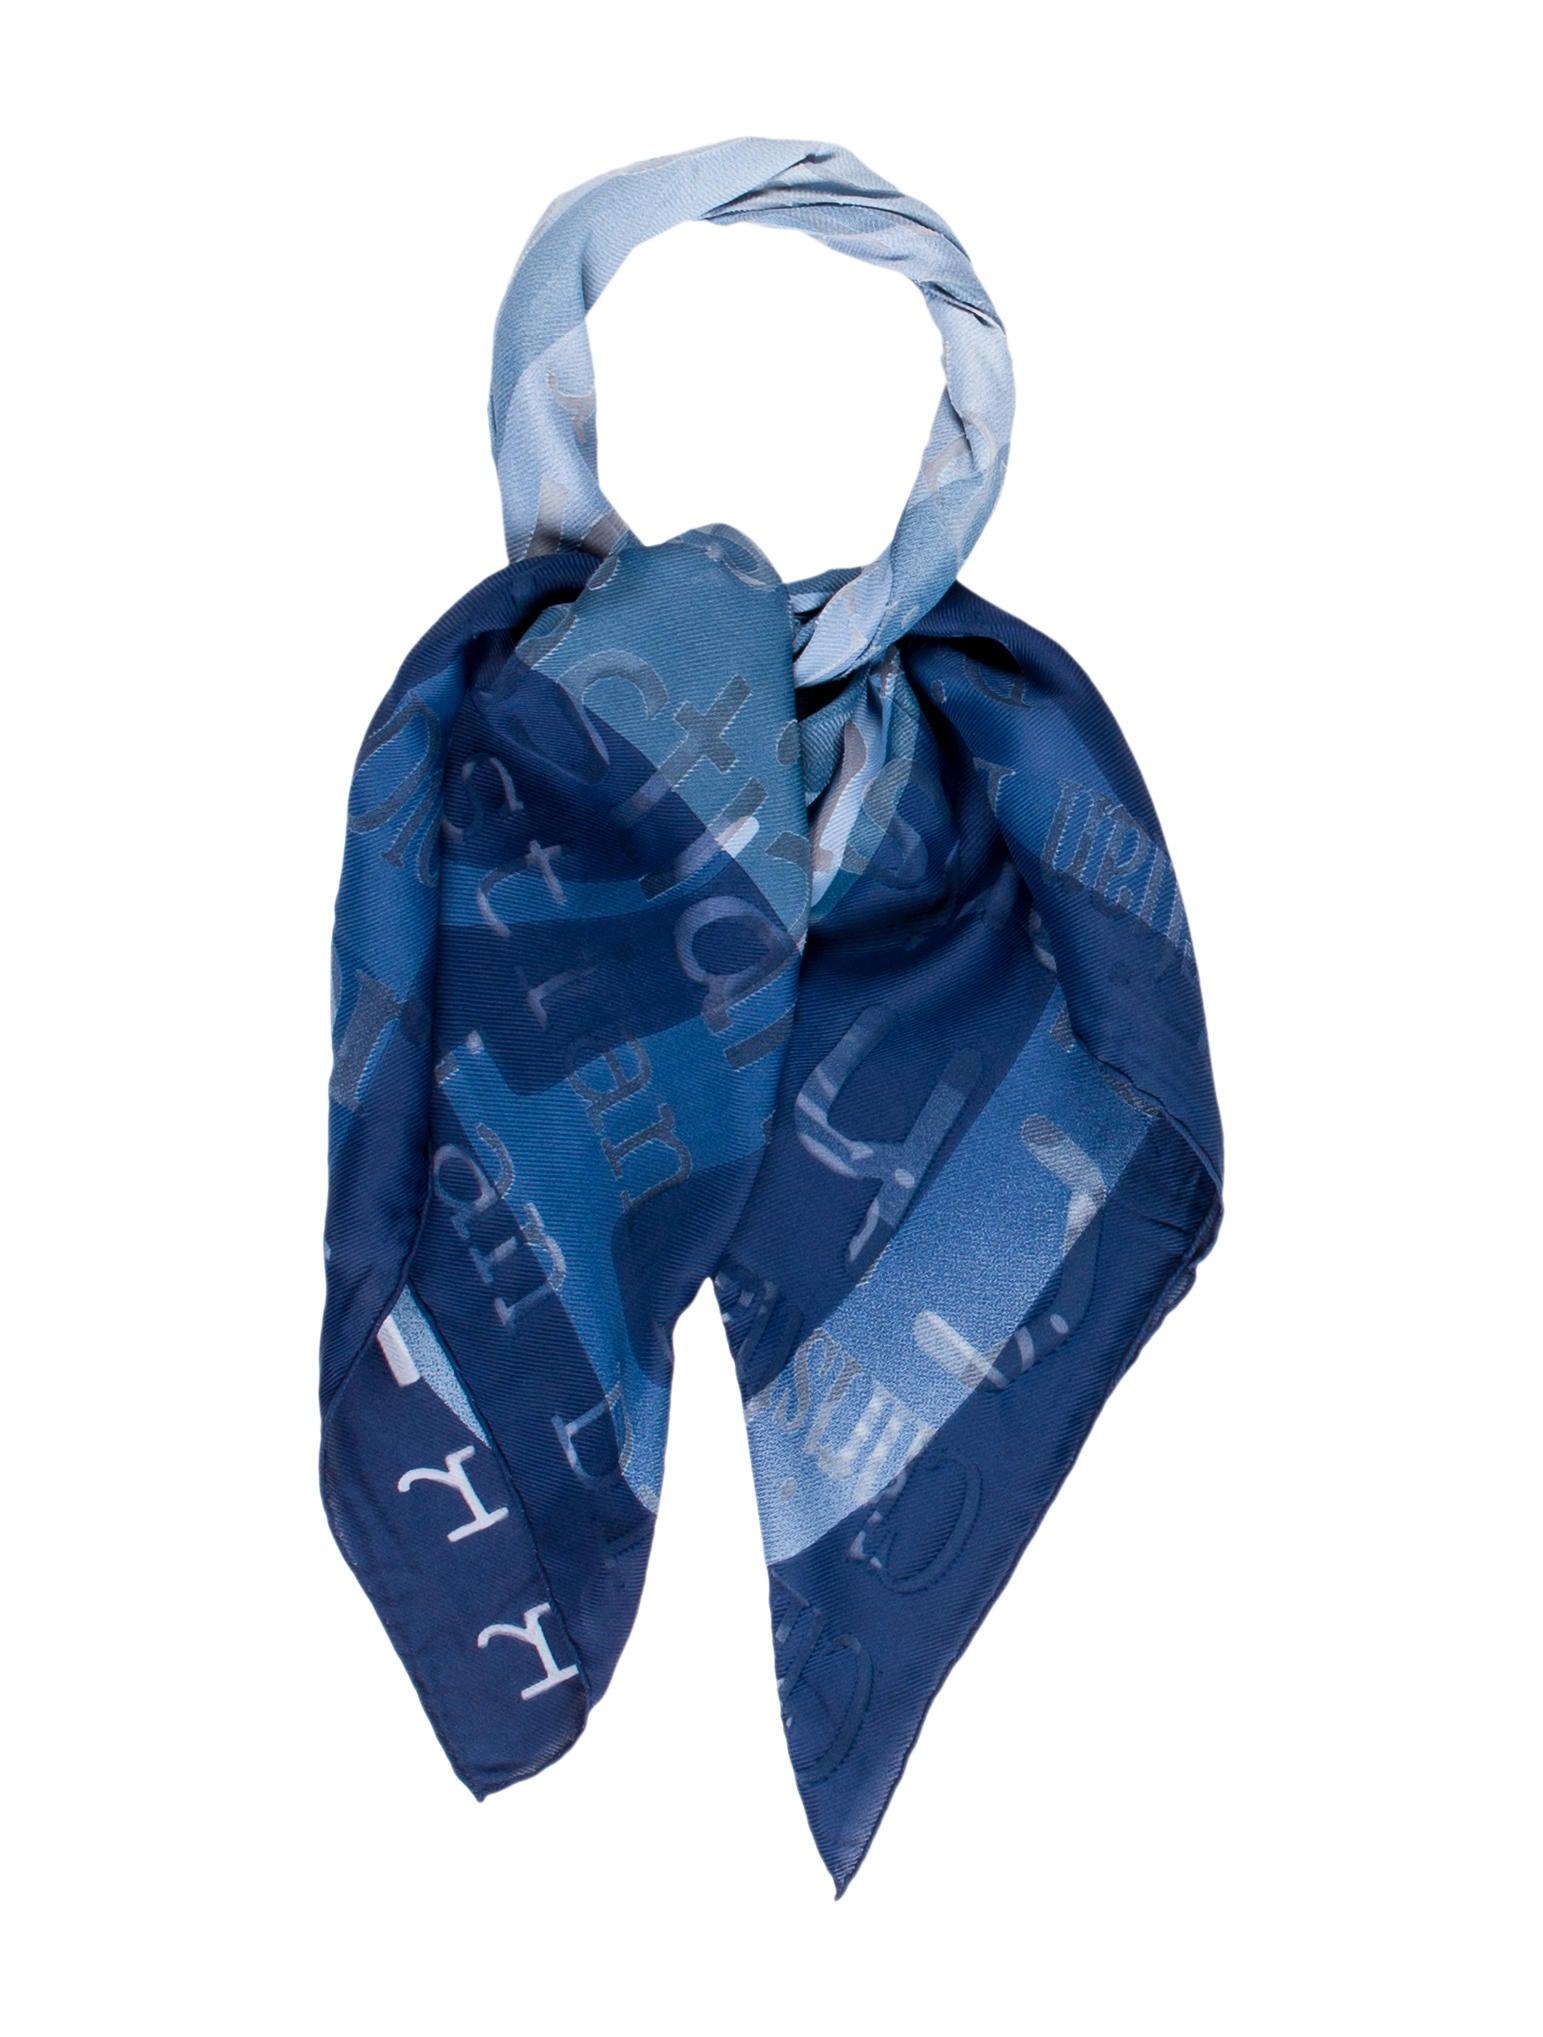 christian lightweight logo scarf accessories